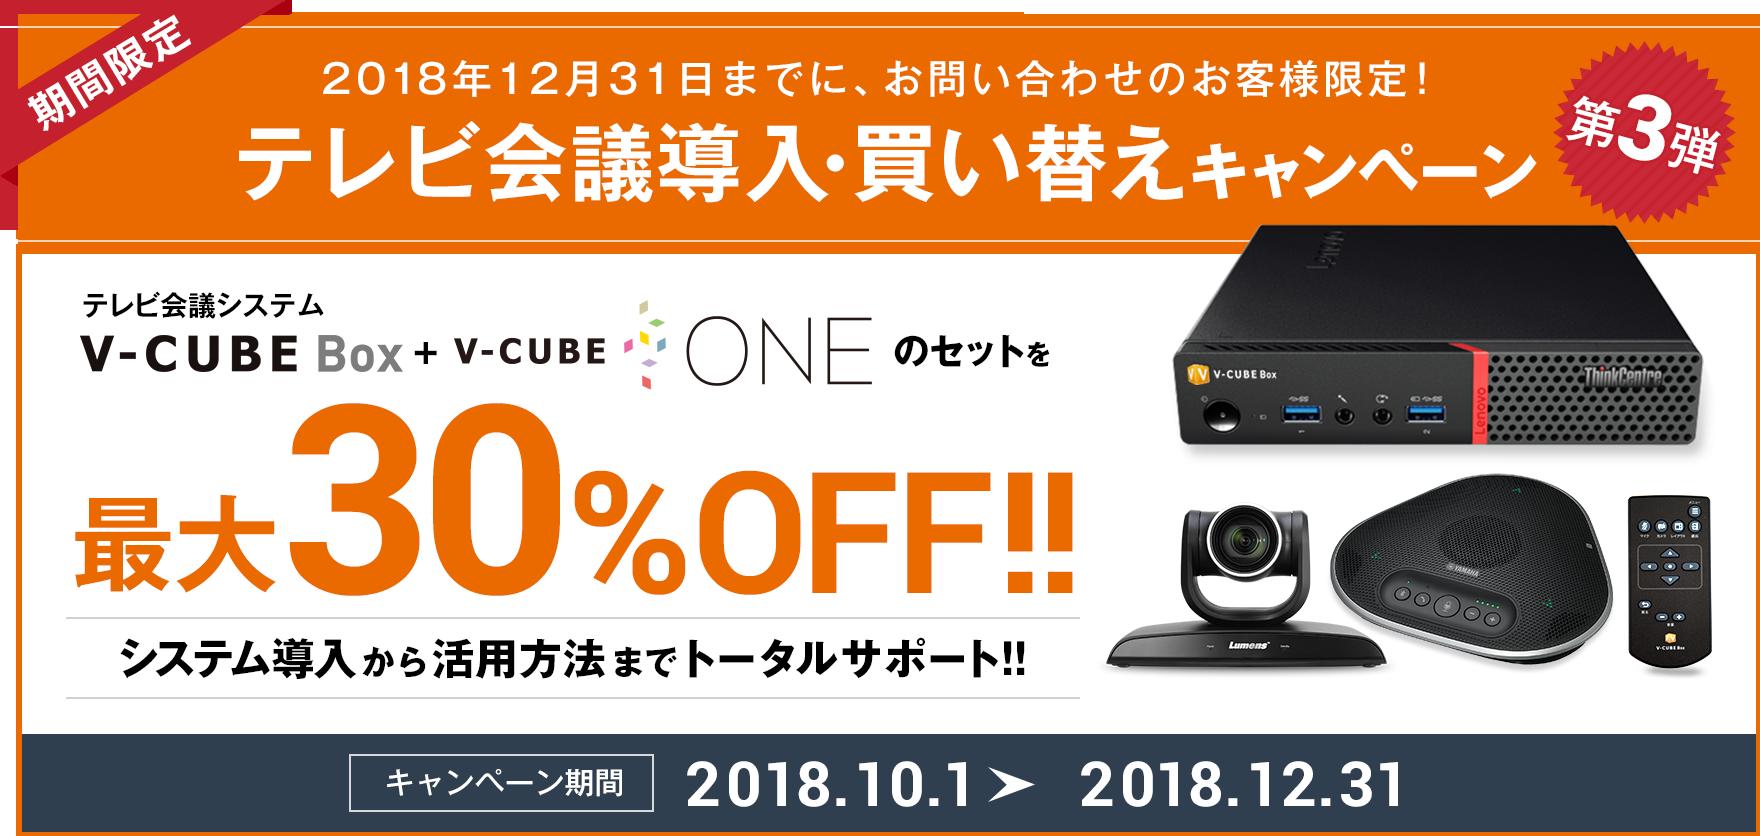 「V-CUBE Box」「V-CUBE One」最大40%OFF!